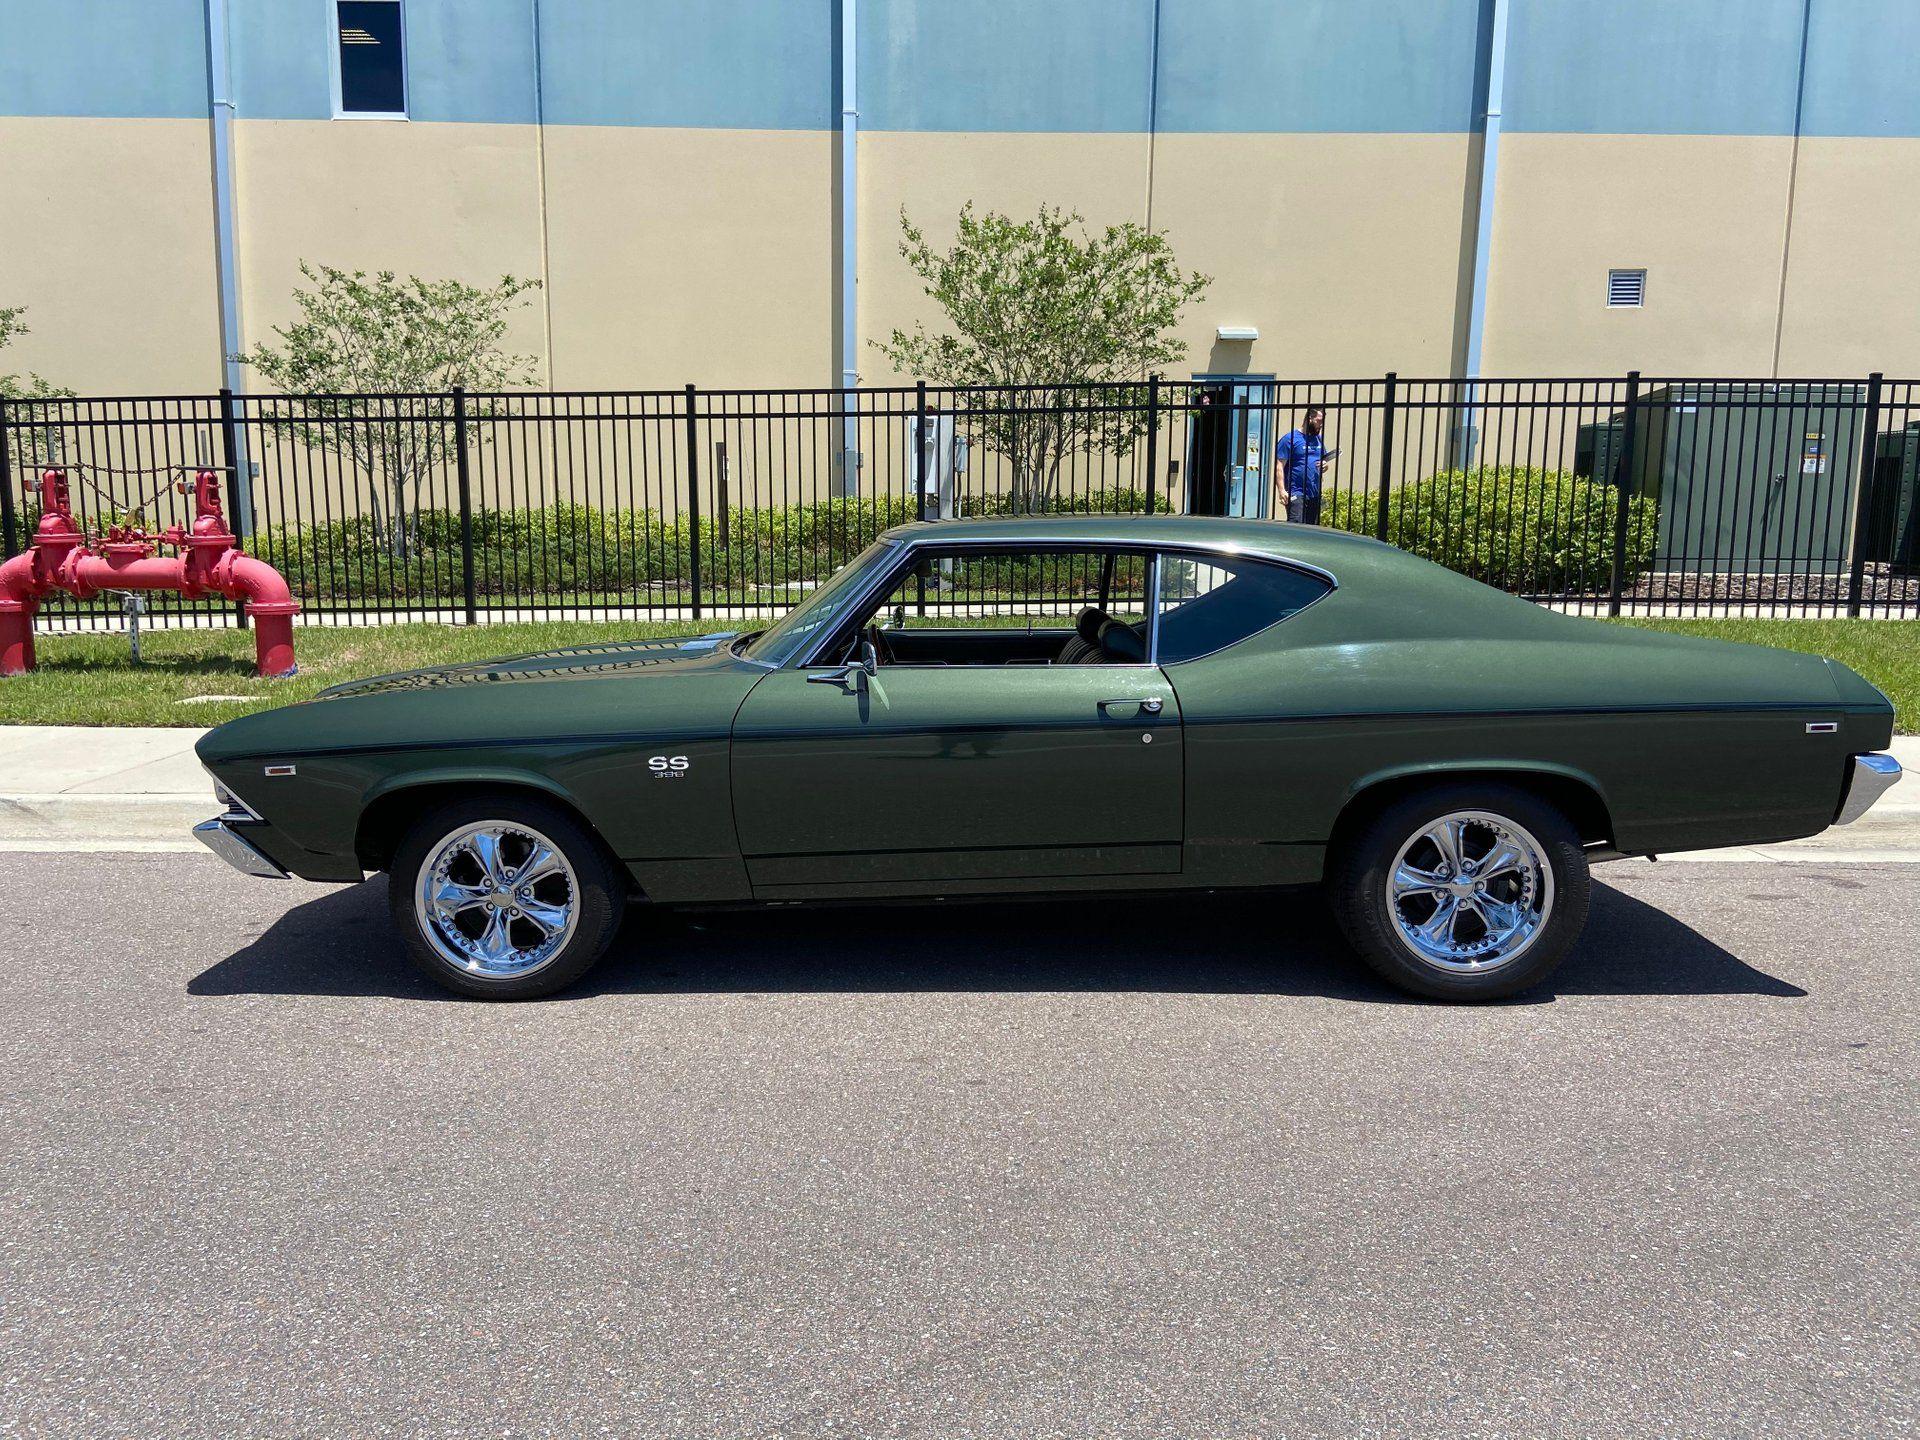 "<img src=""1969-chevrolet-chevelle-ss.jpeg"" alt=""A 1969 Chevrolet Chevelle SS 396"">"